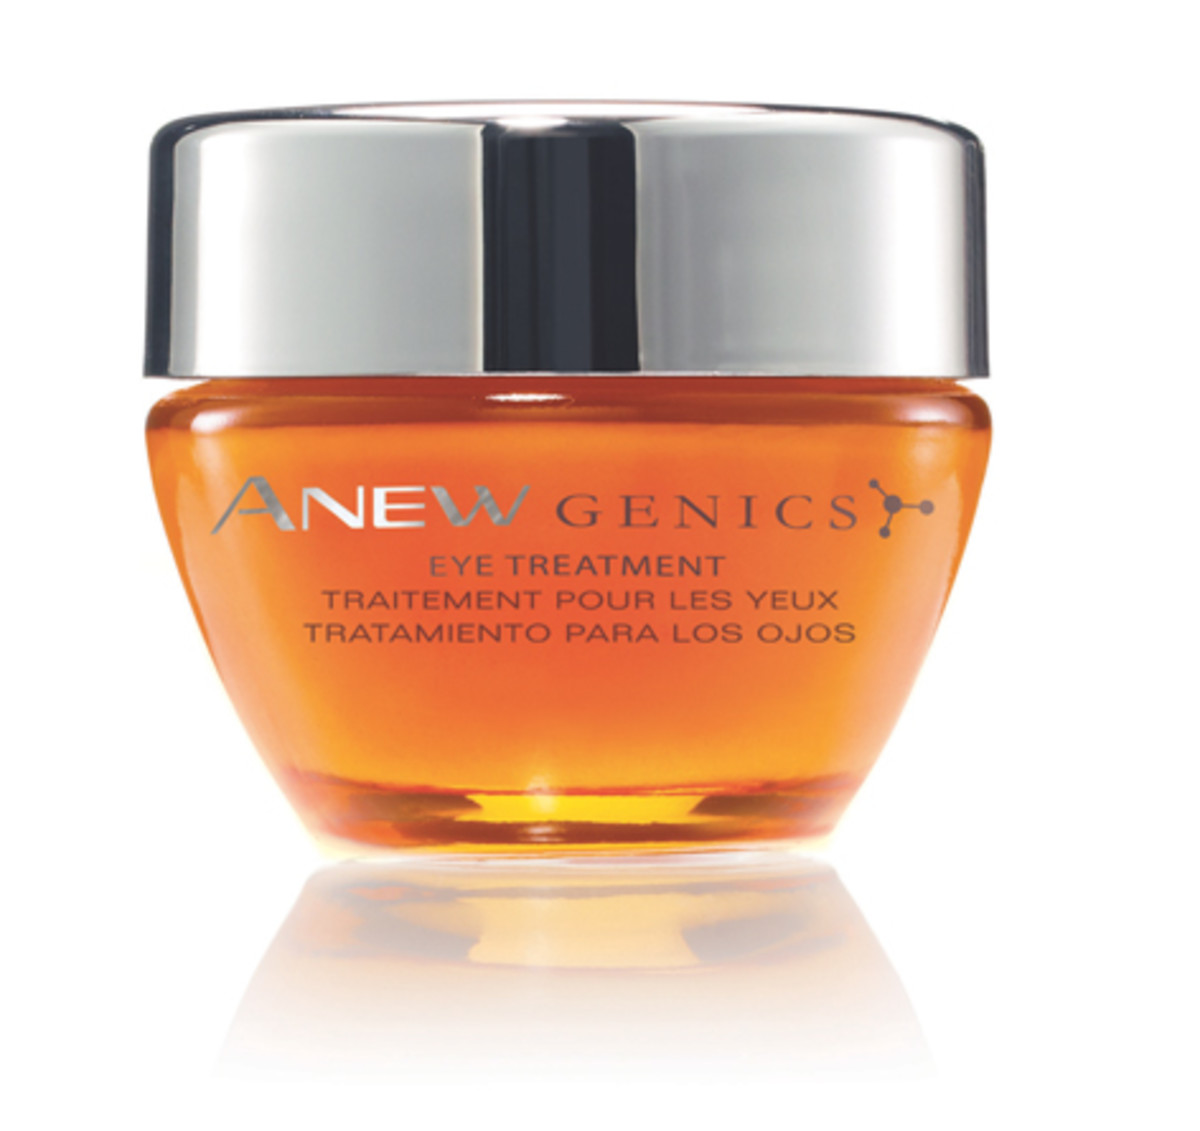 ANEW Genics Eye Treatment